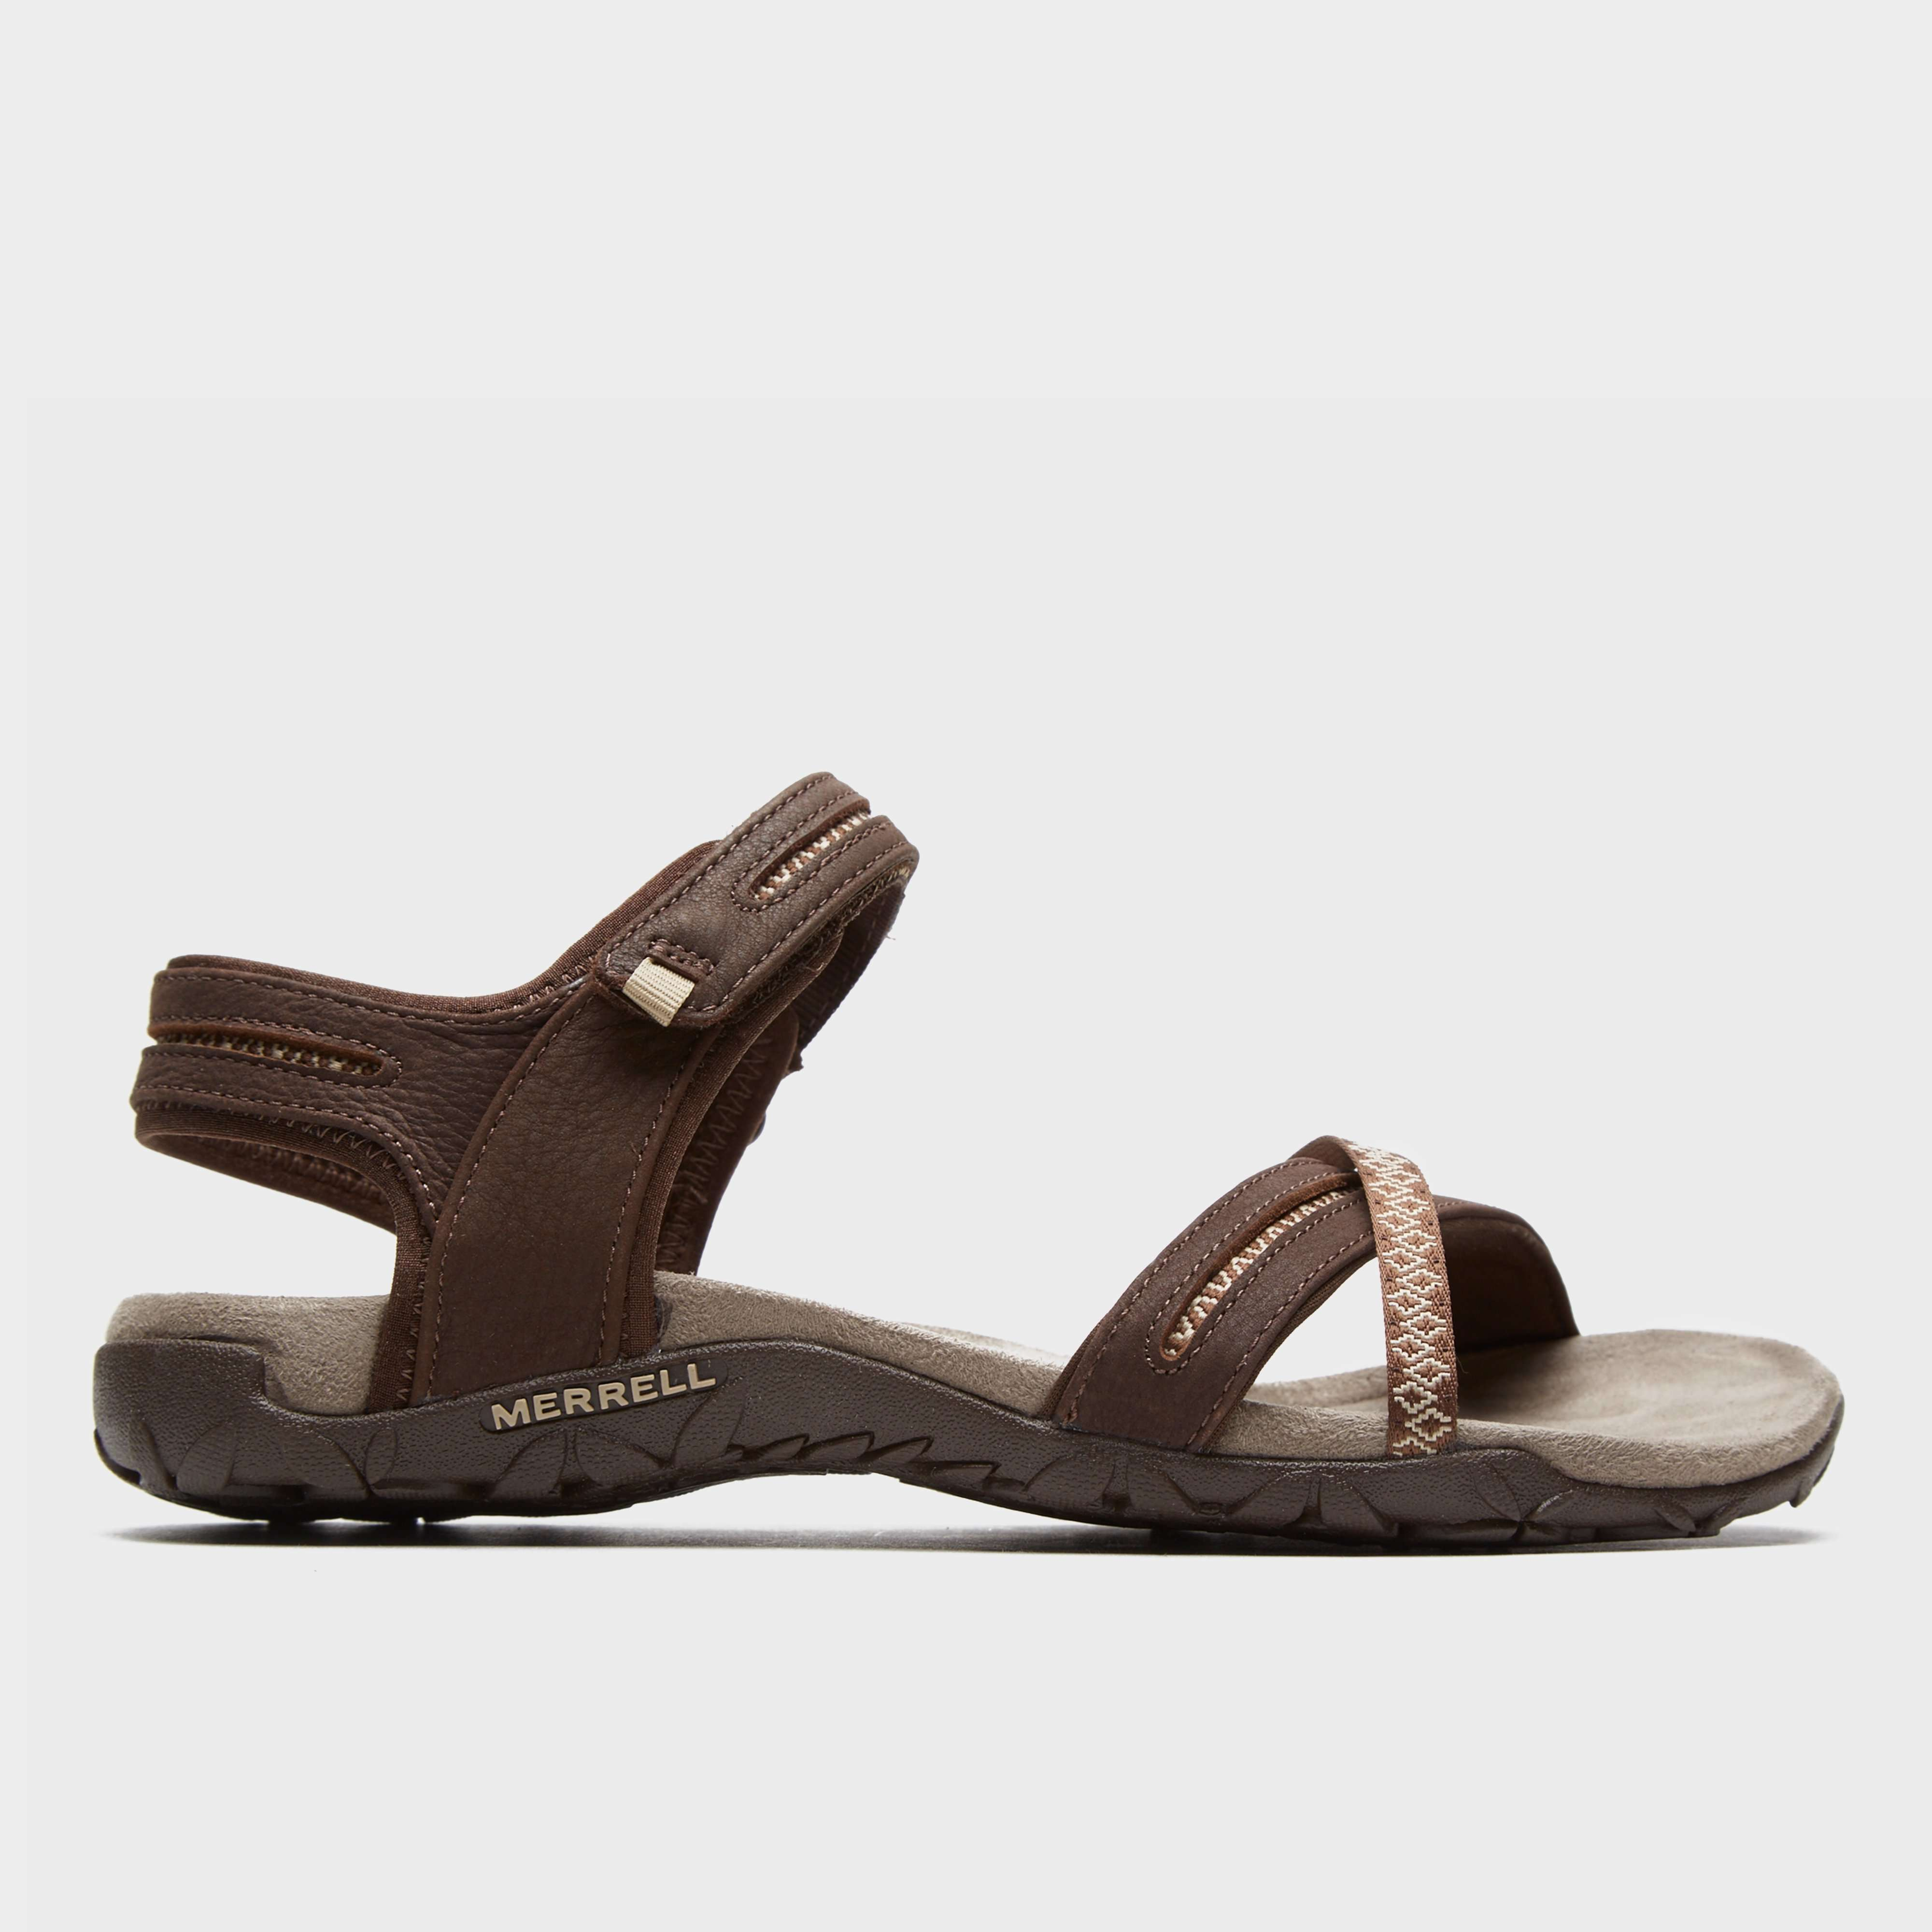 MERRELL Women's Terran Cross Sandals